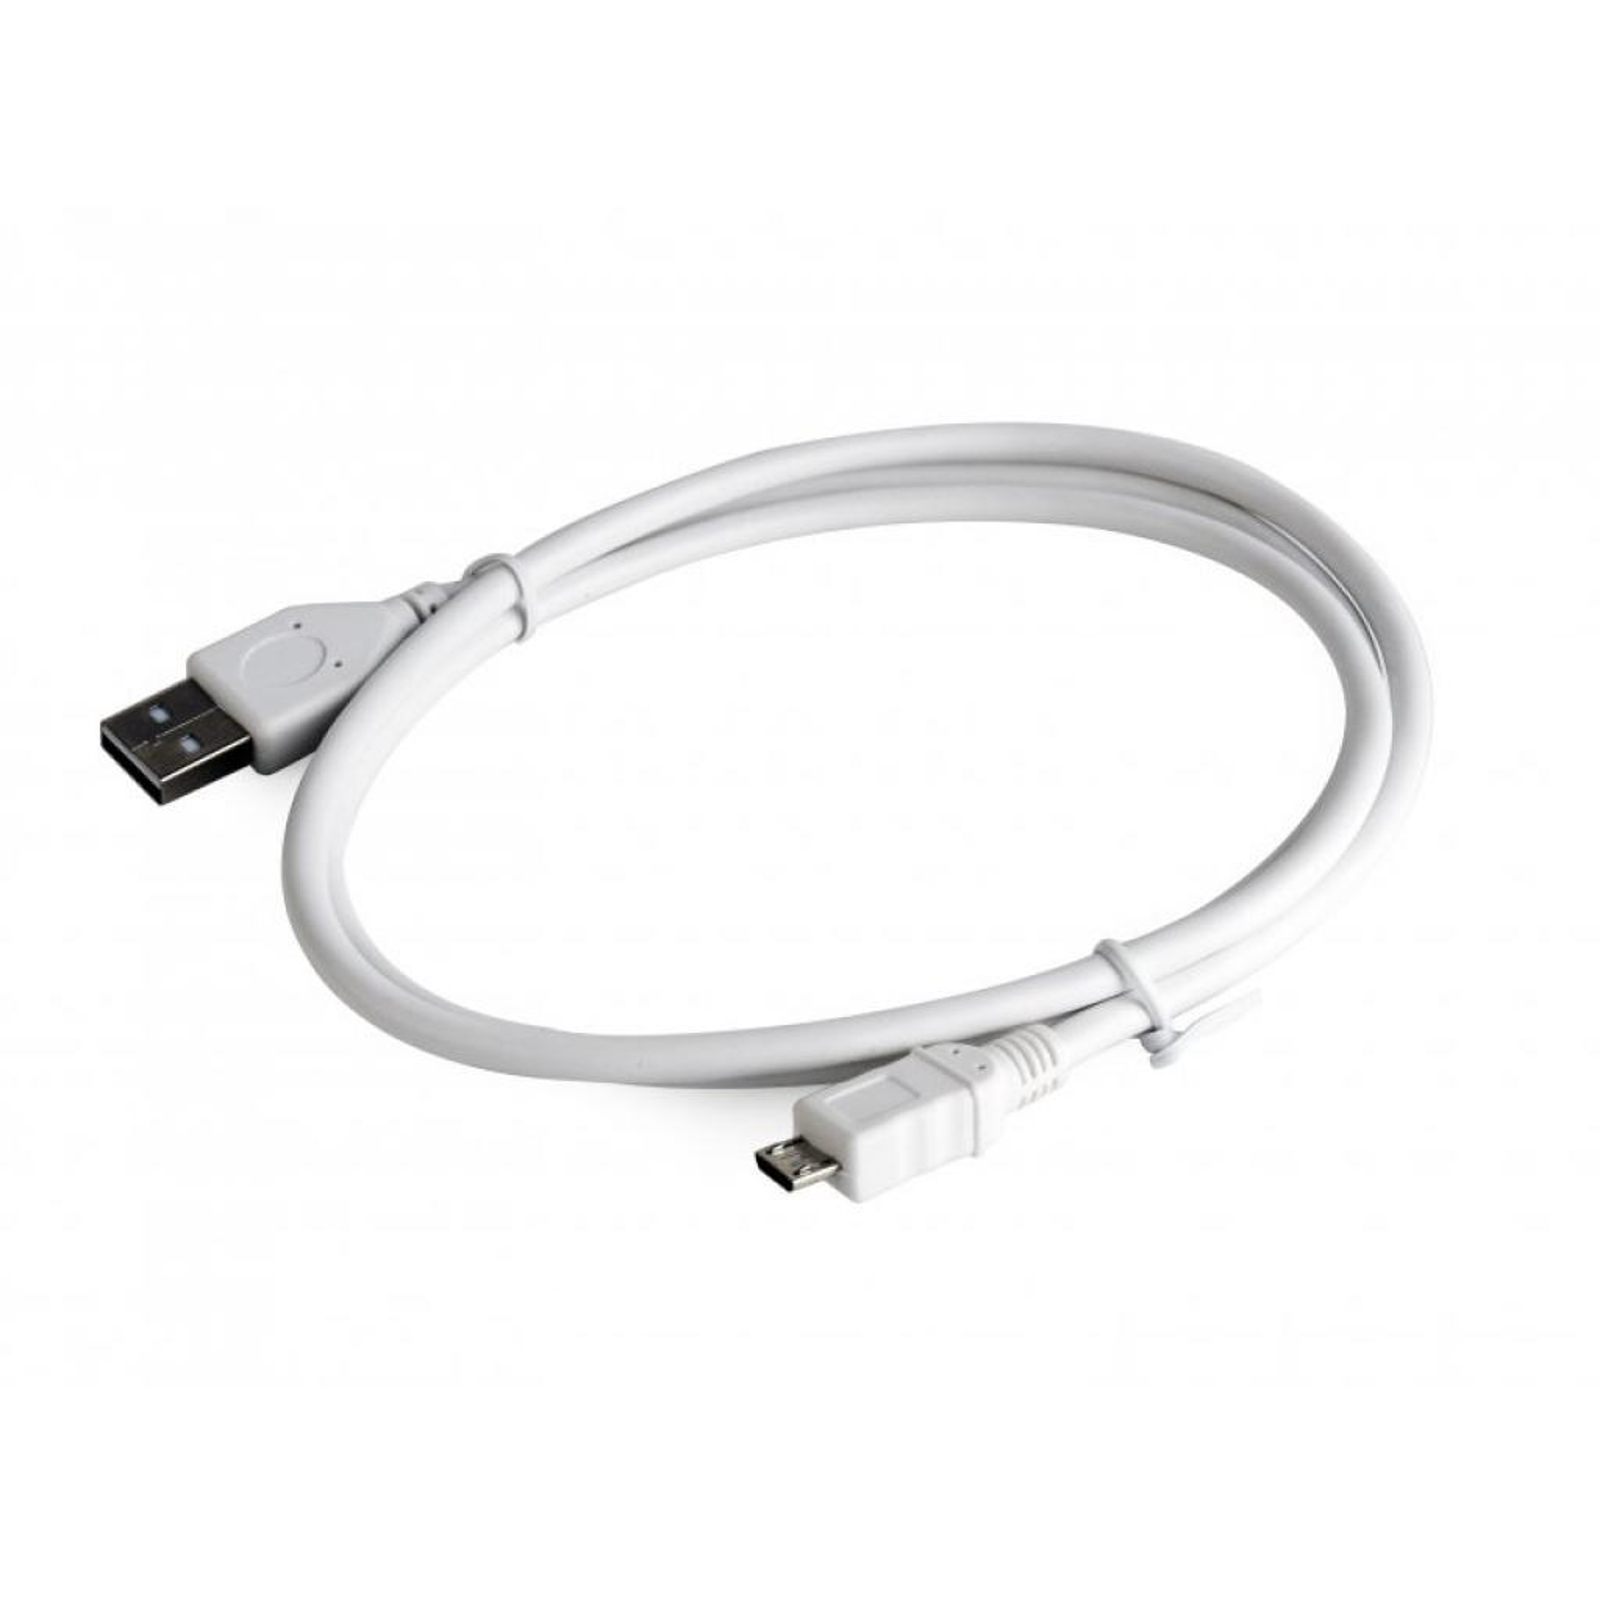 Дата кабель USB 2.0 AM to Micro 5P 0.1m Cablexpert (CCP-mUSB2-AMBM-W-0.1M) изображение 2